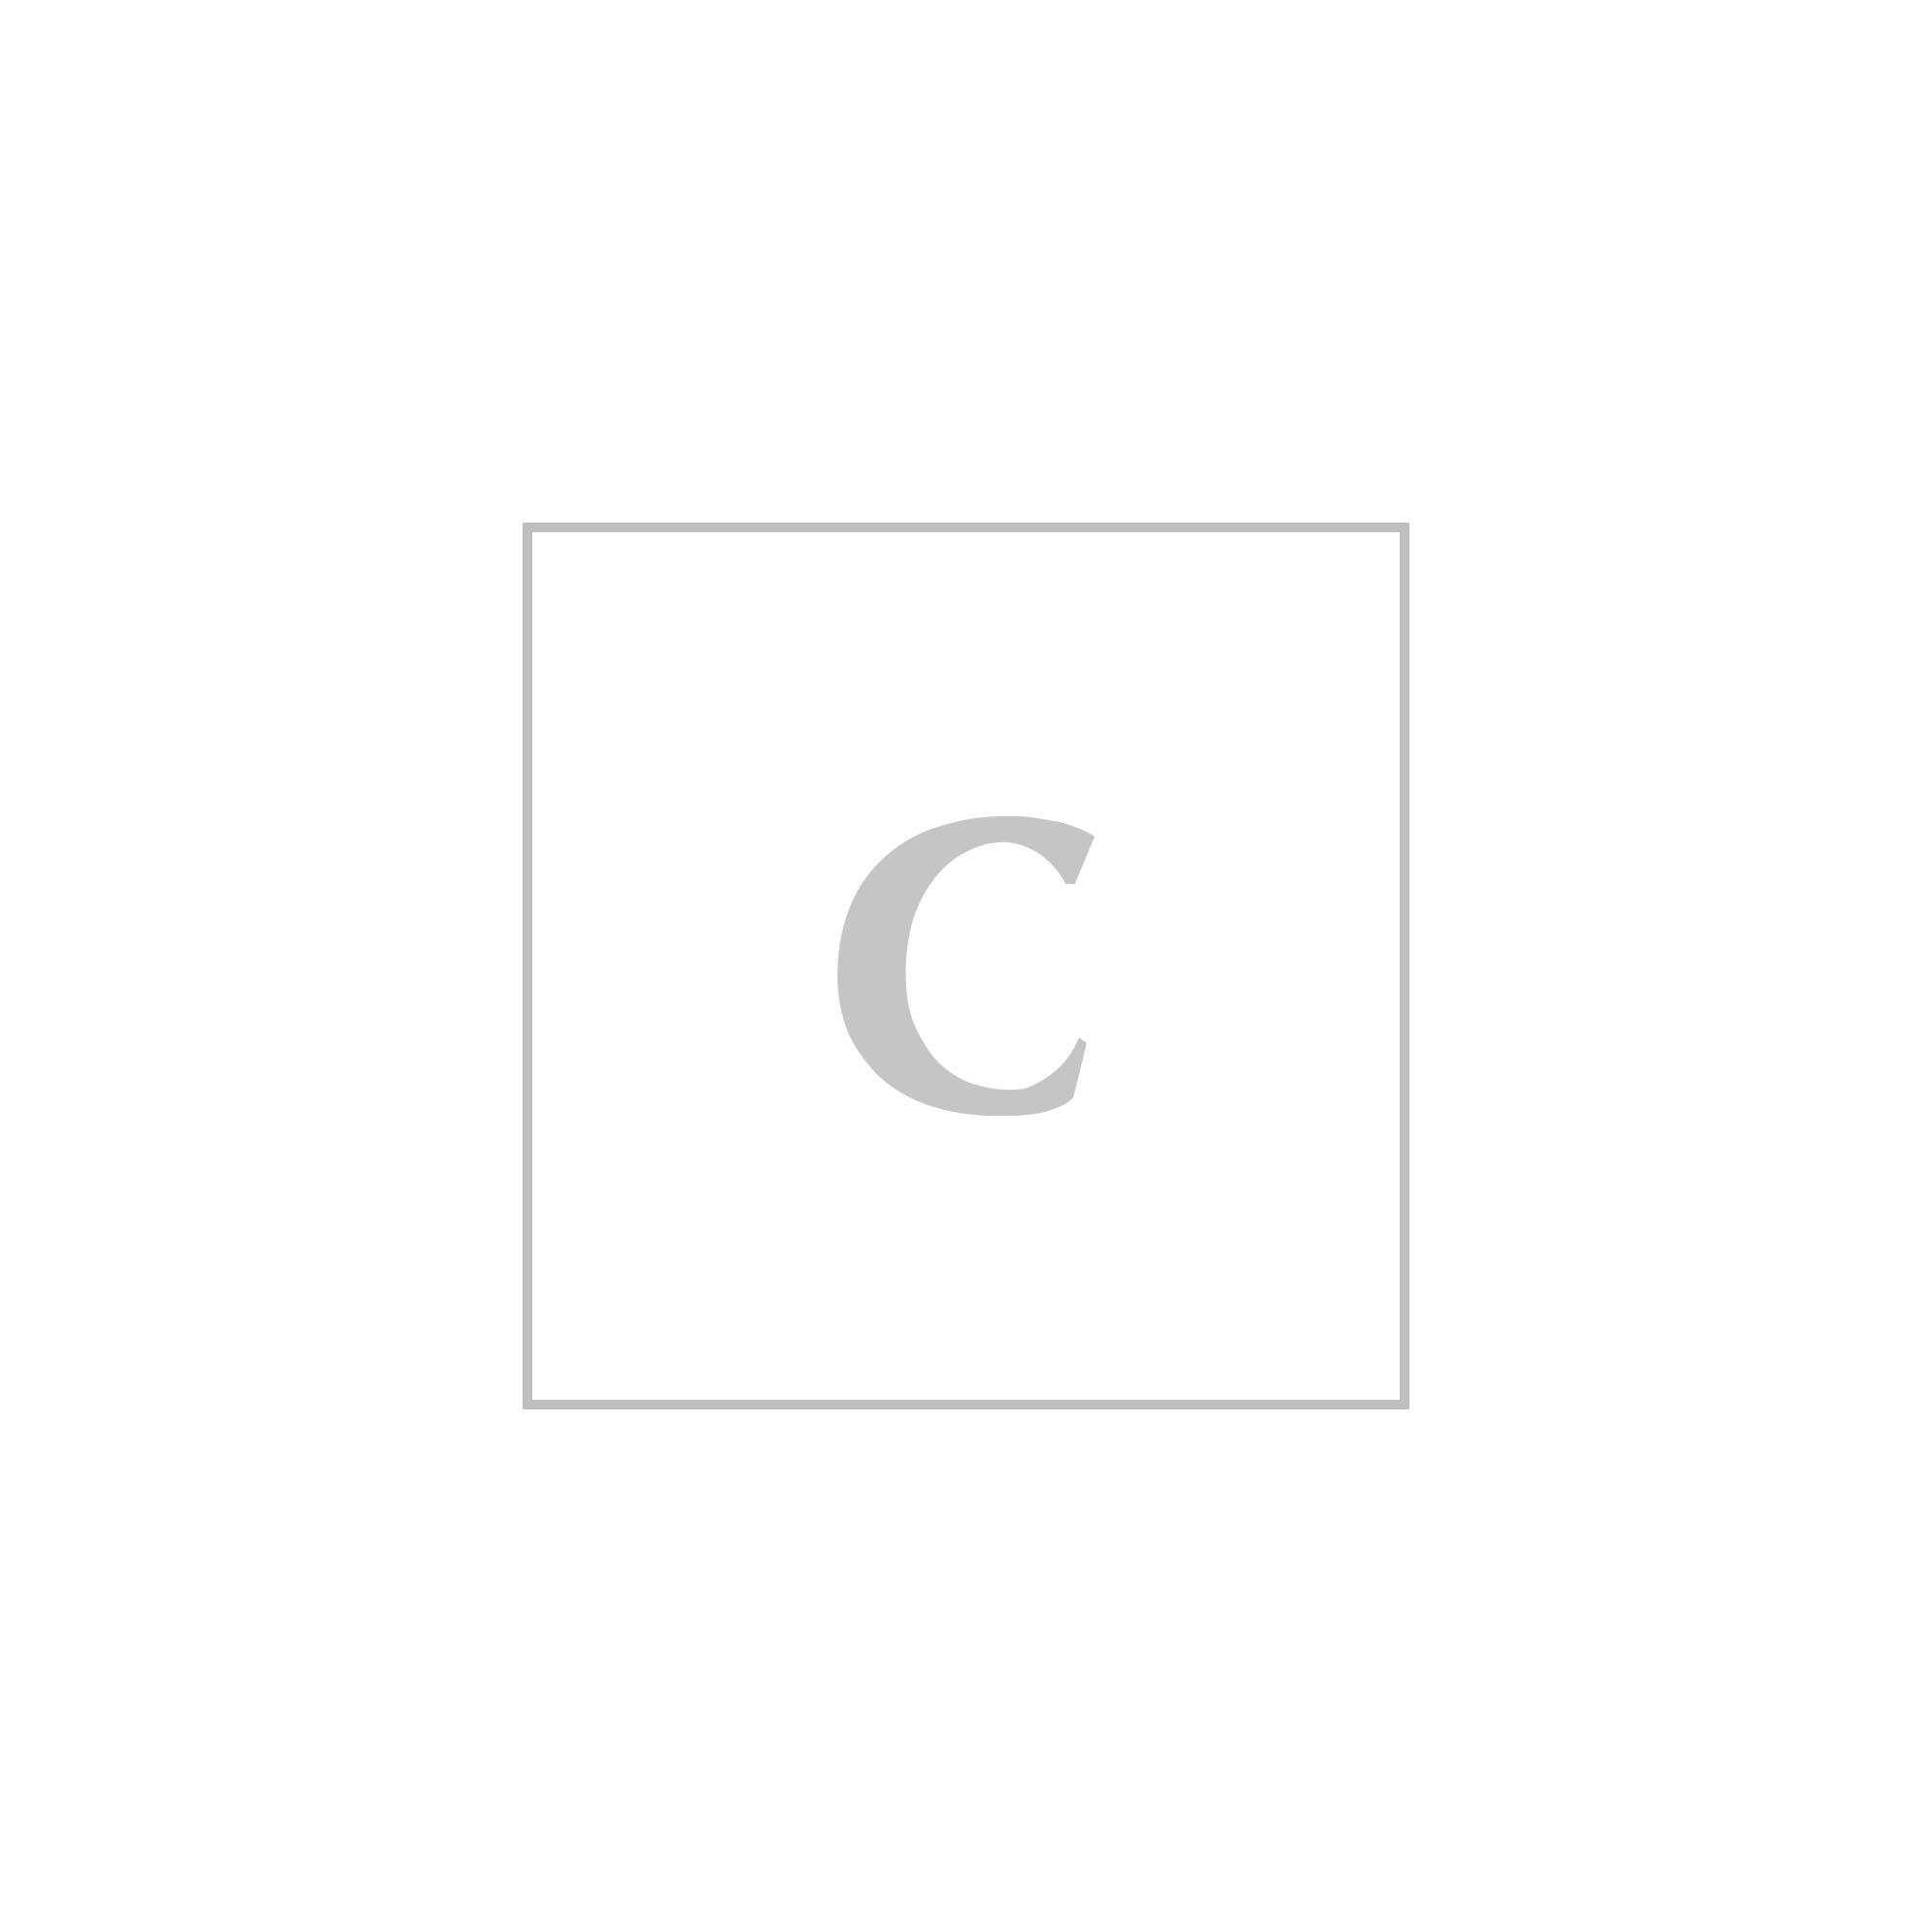 Prada logo turtleneck